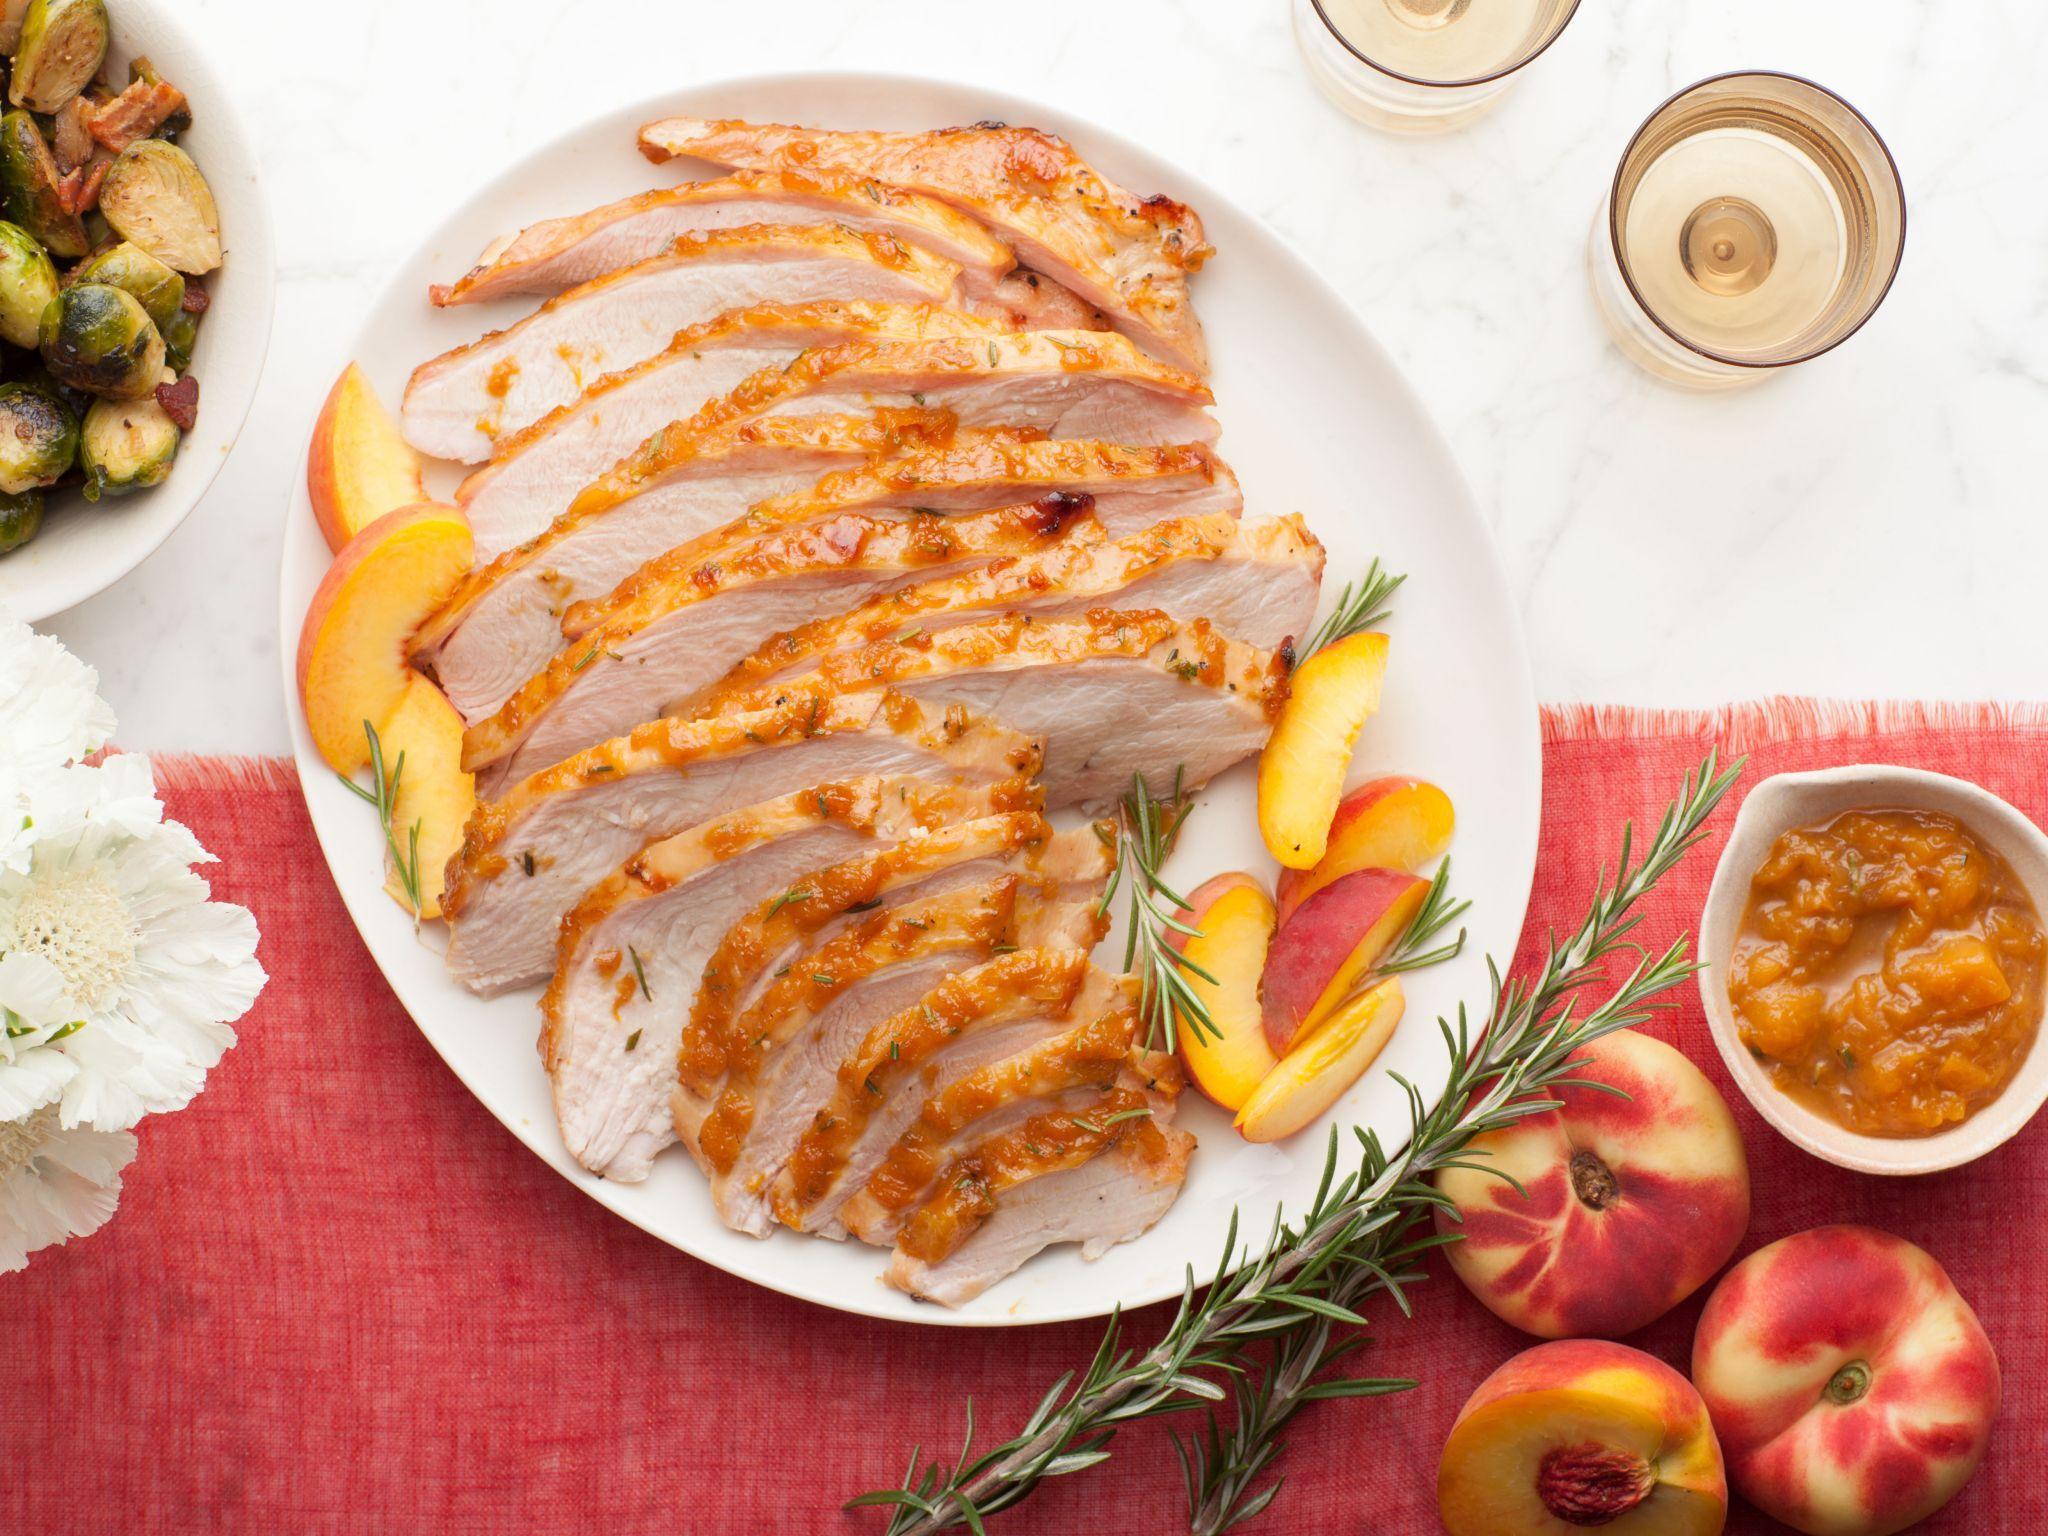 Roasted turkey breast with peach rosemary glaze recipe sunny roasted turkey breast with peach rosemary glaze recipe sunny anderson roast turkey breast and roasted turkey forumfinder Choice Image